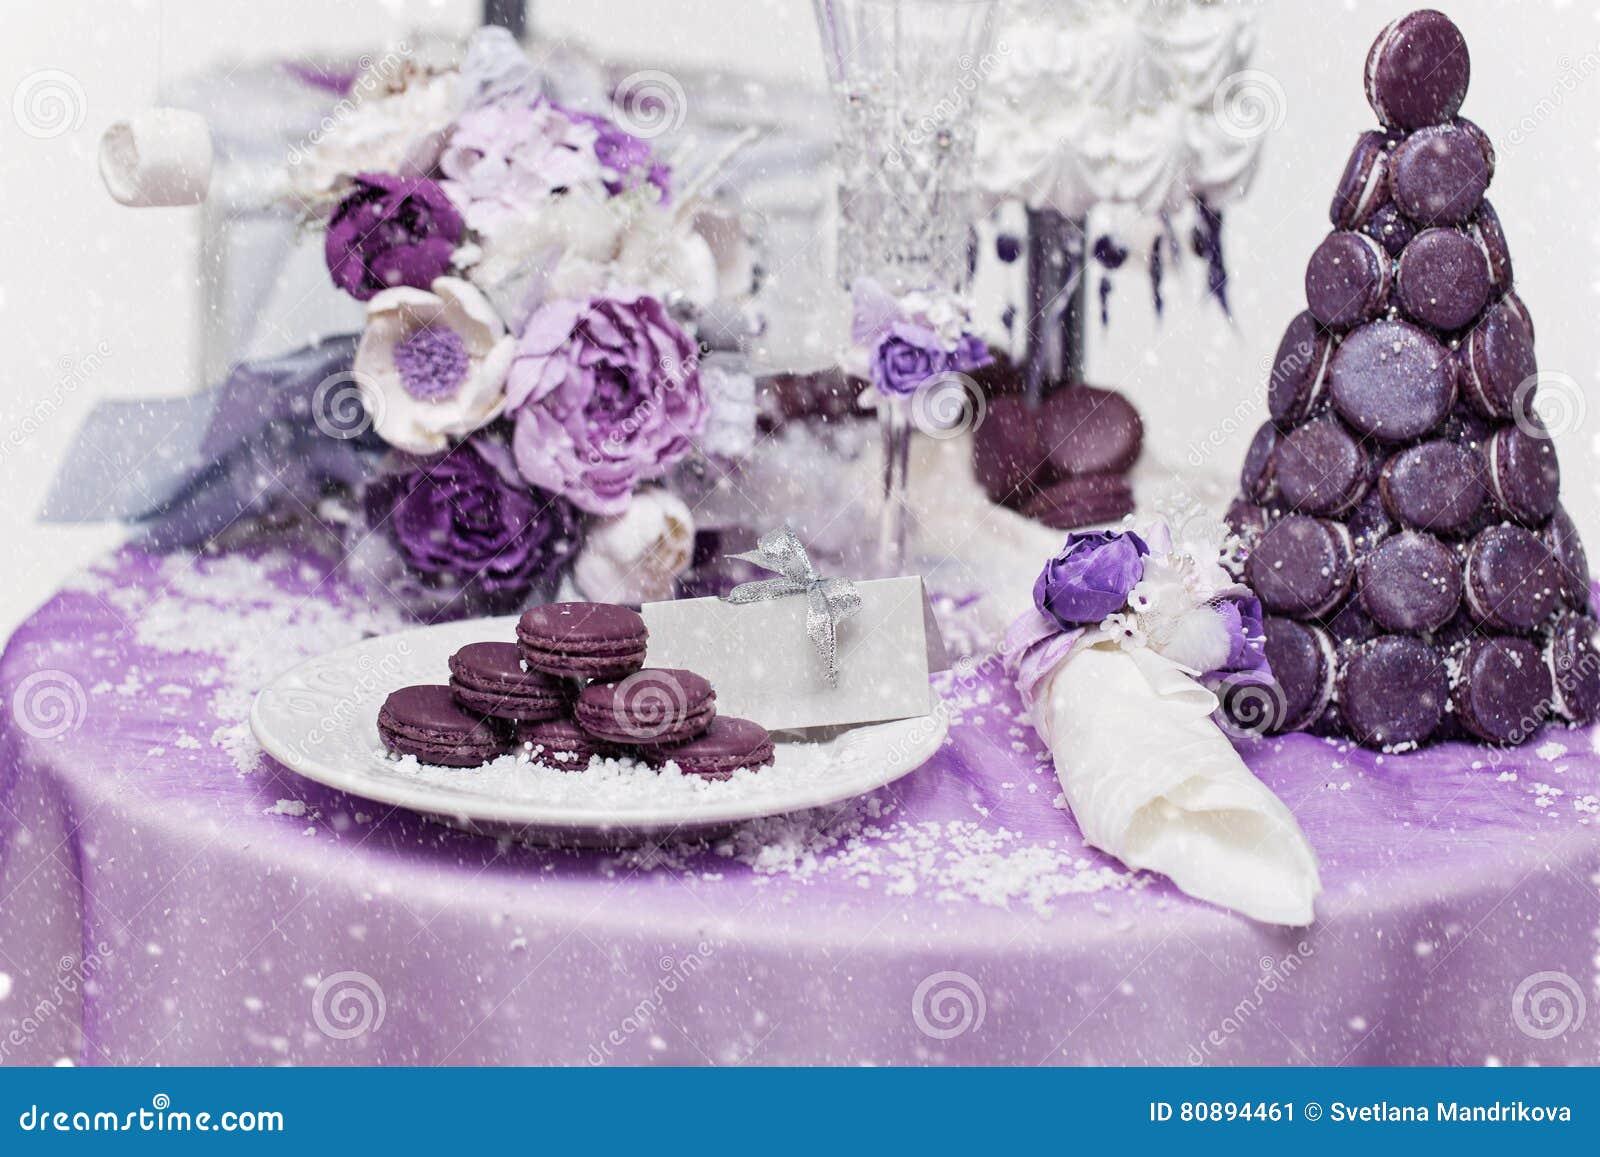 Set Of Three Wedding Croquembouche Cakes Stock Image Image Of Bridal Macaron 80894461